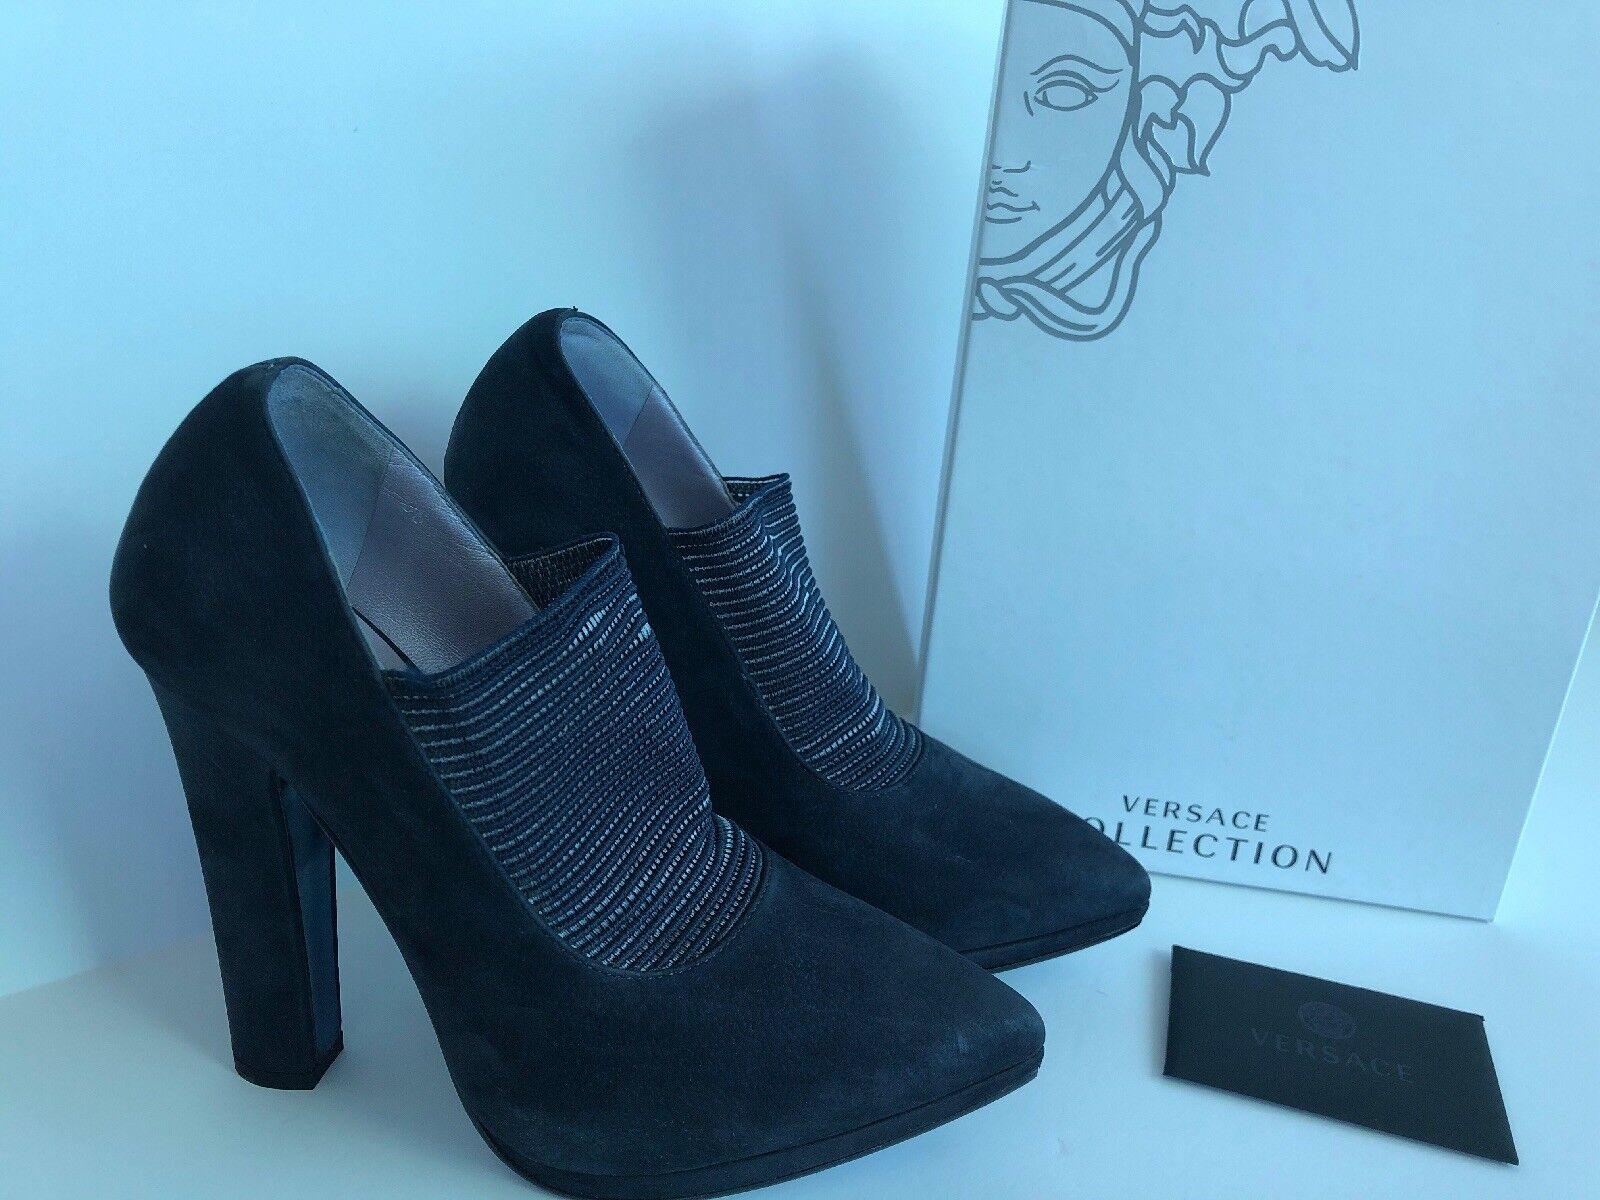 Versace Platform  Scarpe Donne Dimensione 36  vendita outlet online